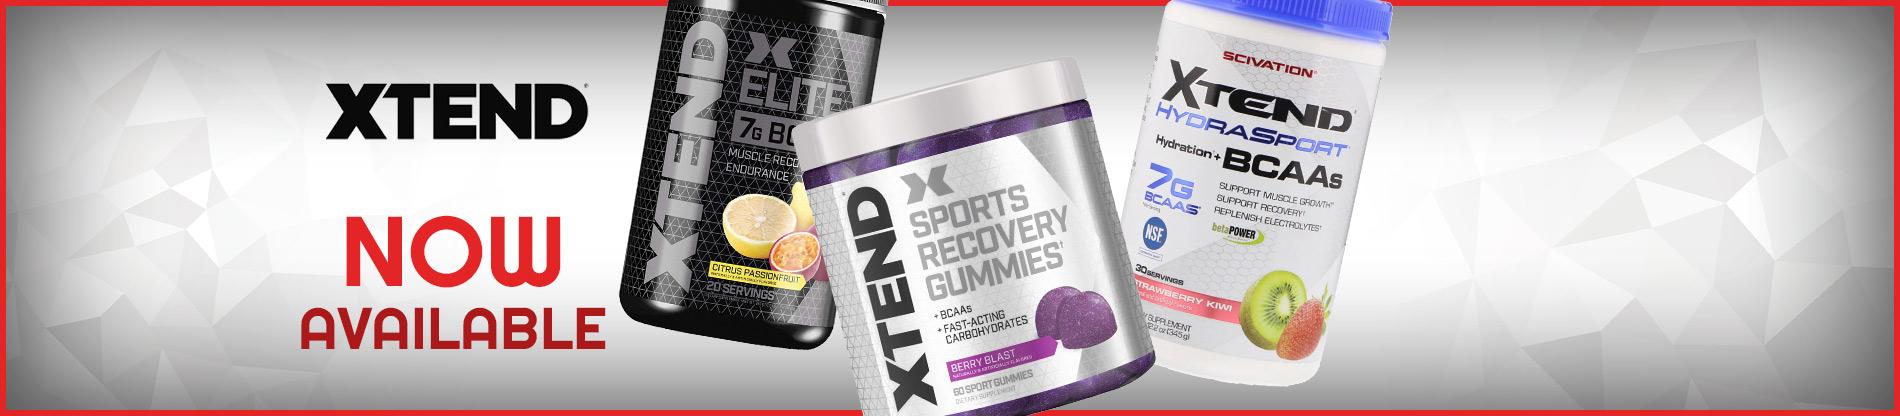 Doctor's Best Serrapeptase - Bodybuilding and Sports Supplements